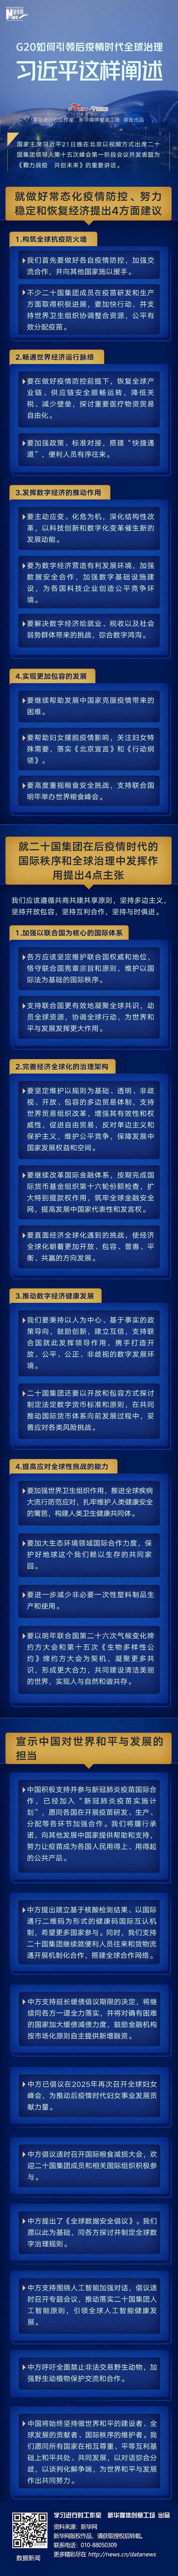 usdt充值接口(caibao.it):G20若何引领后疫情时代全球治理,习近平这样论述 第1张